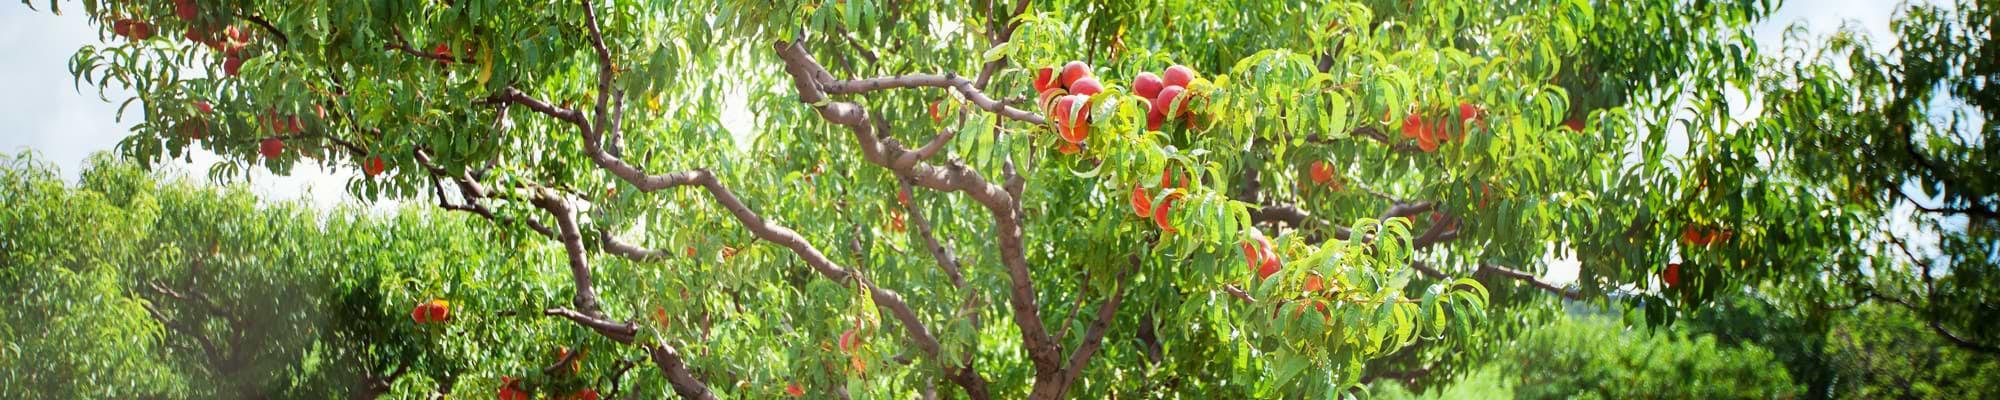 Aprikosenbaum Elbak in Griechenland